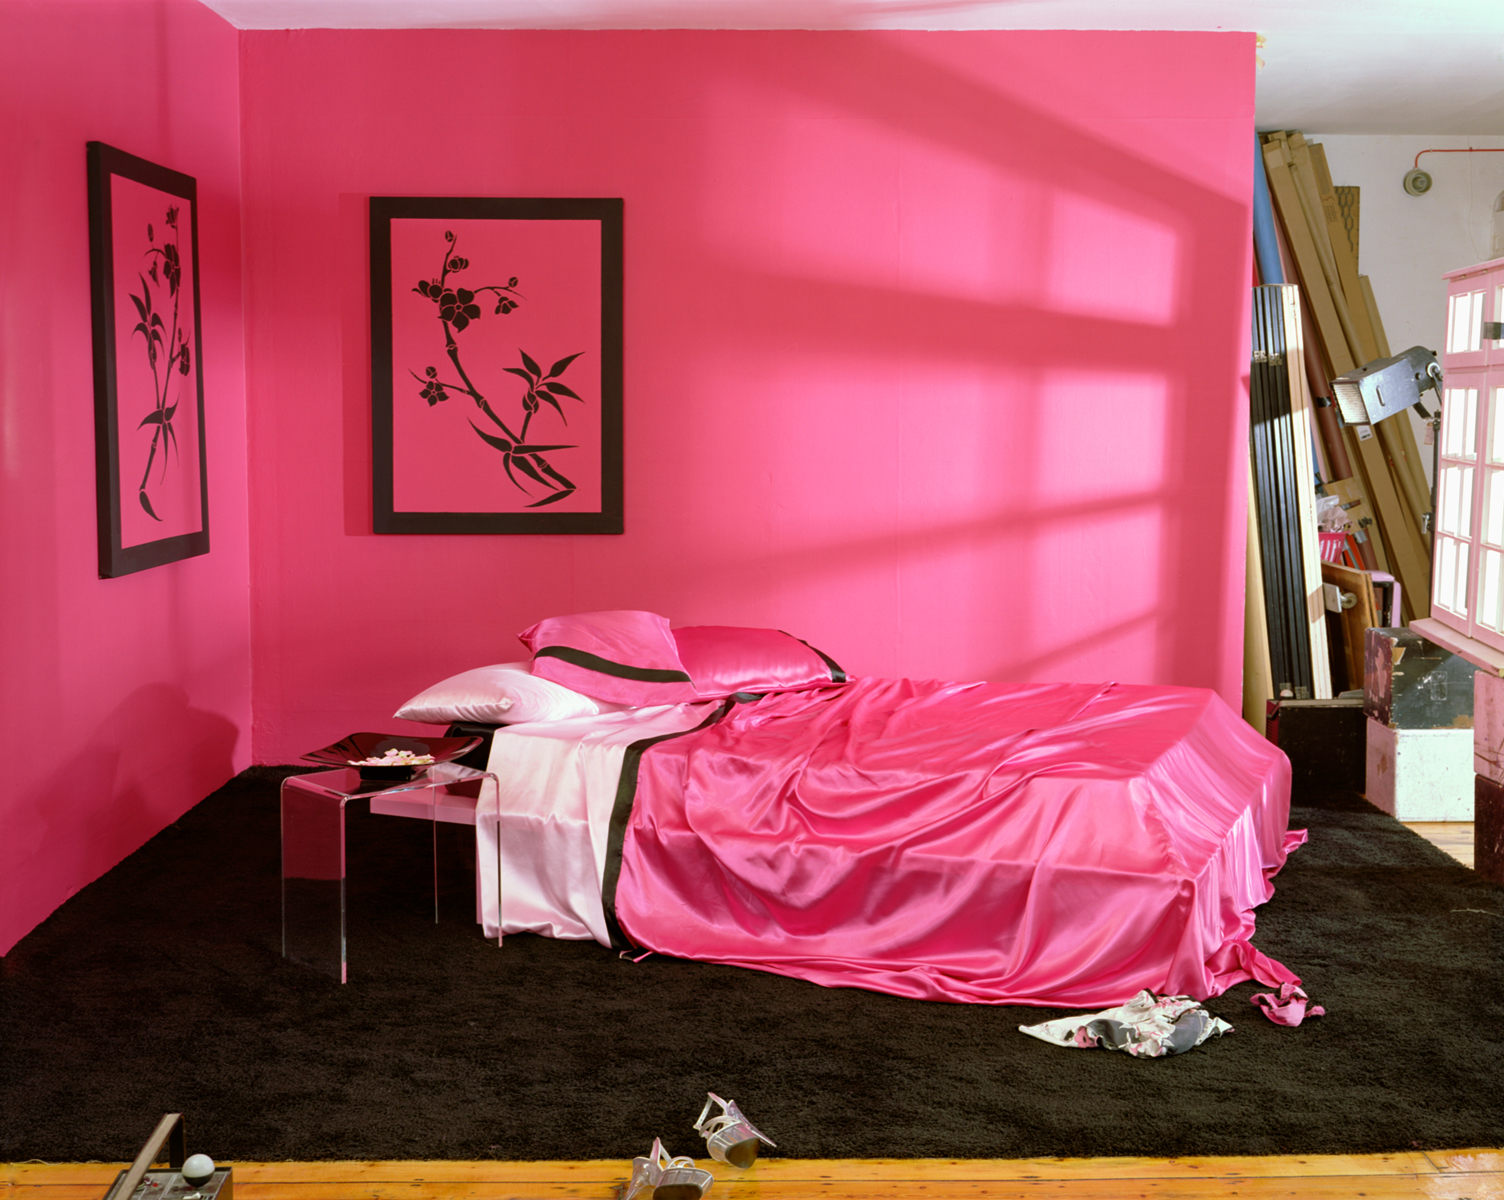 Empty Porn sets, Pink Satin sheets